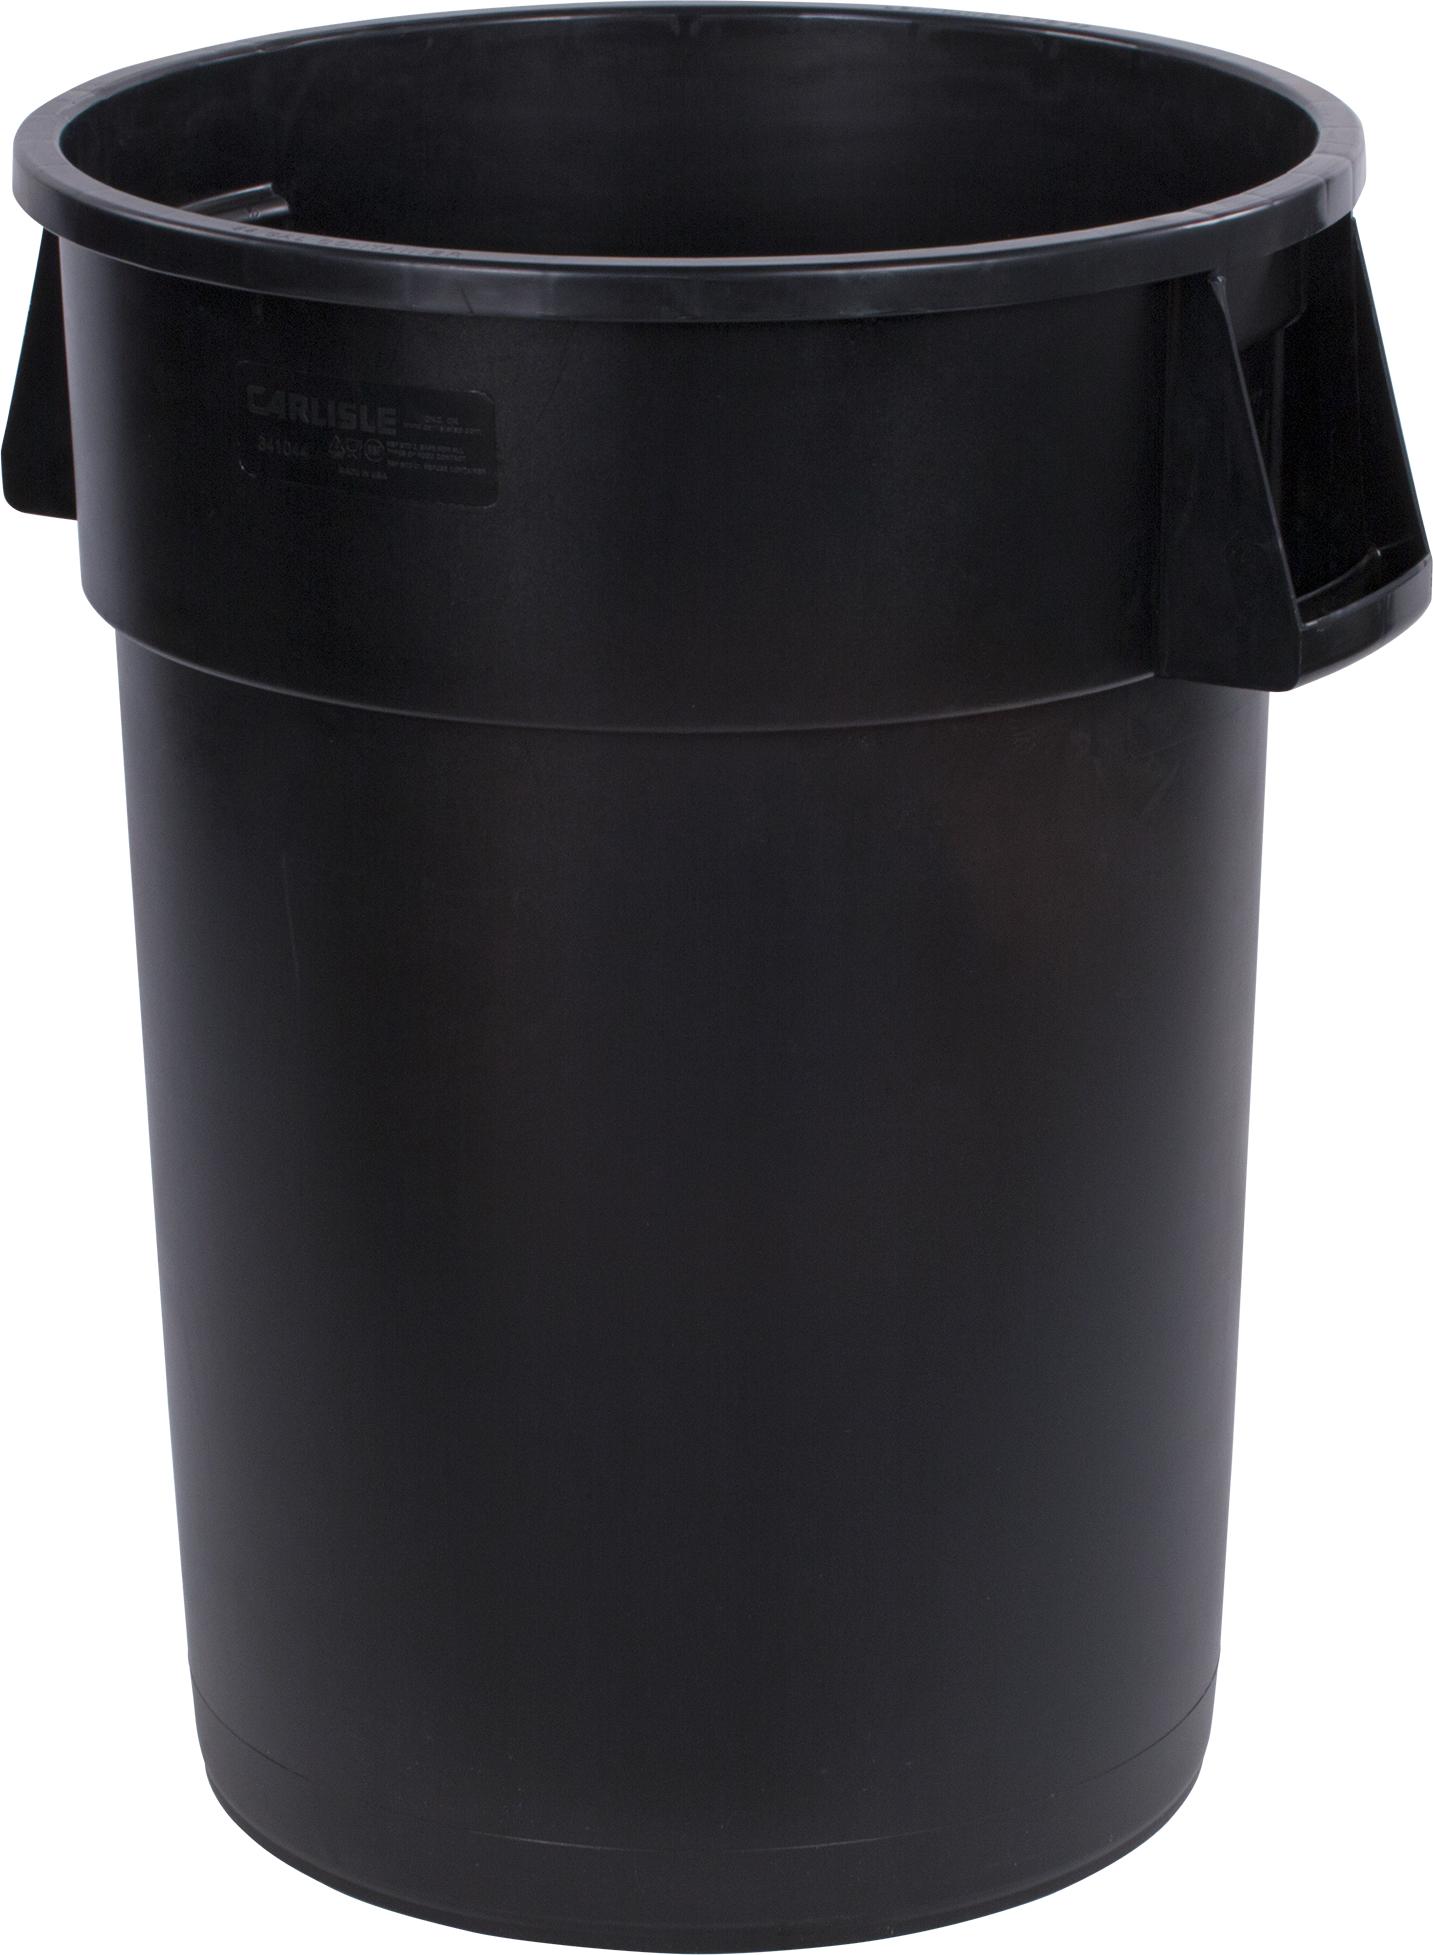 Bronco Round Waste Bin Trash Container 44 Gallon - Black